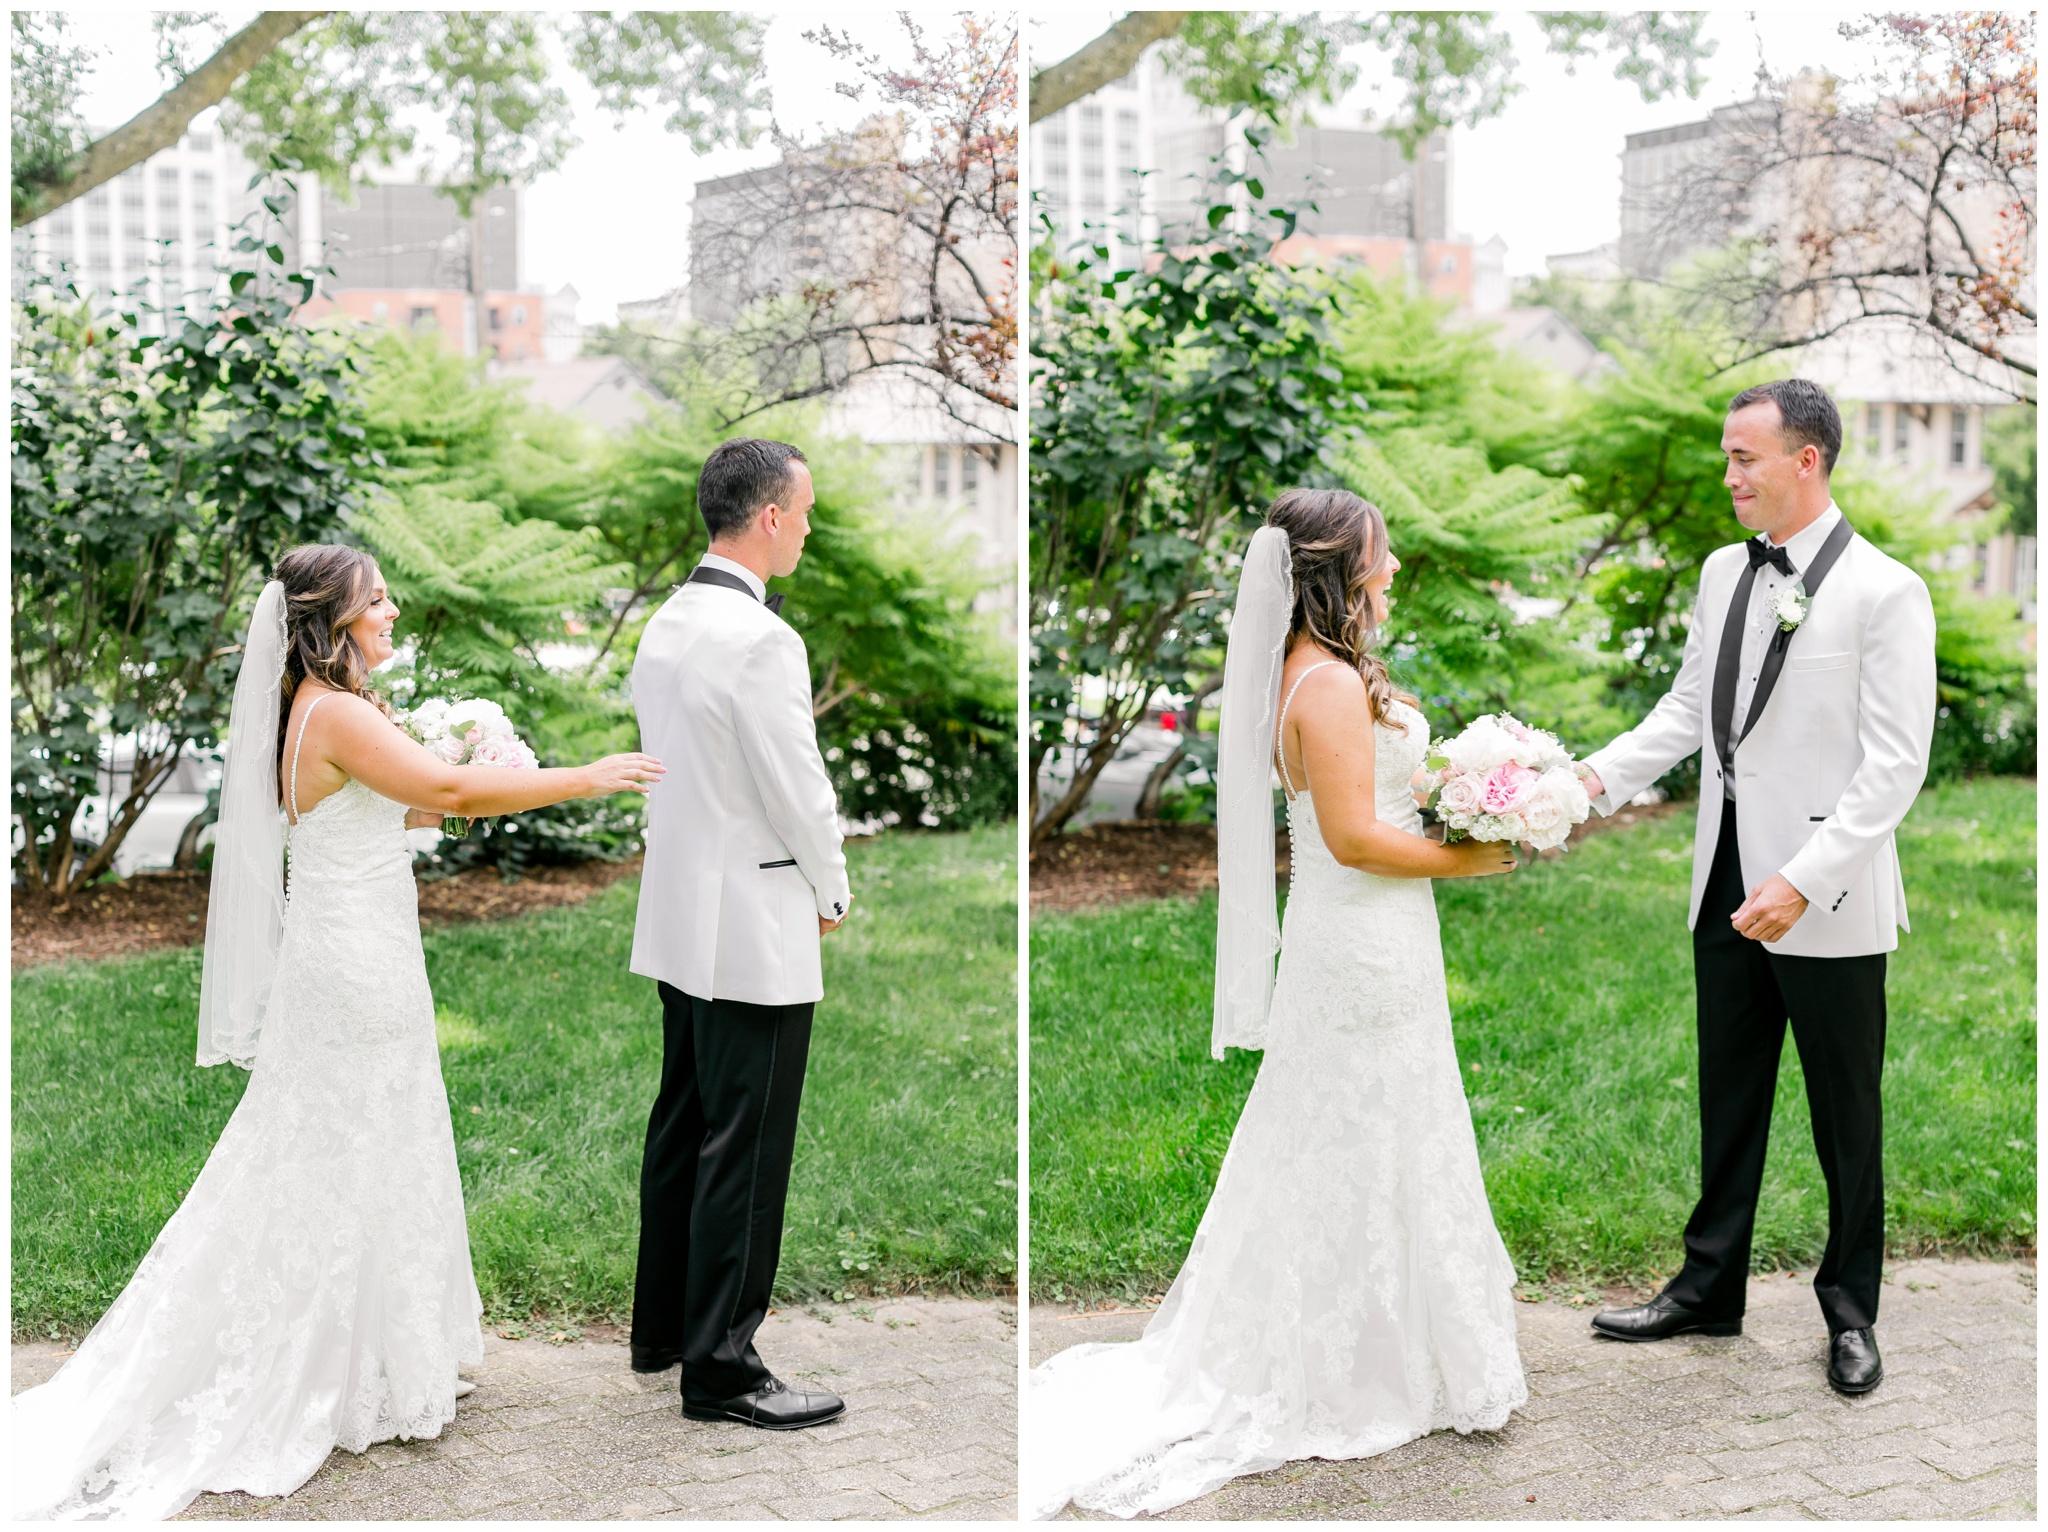 UW_Memorial_Union_wedding_madison_wisconsin_wedding_photographers_4589.jpg